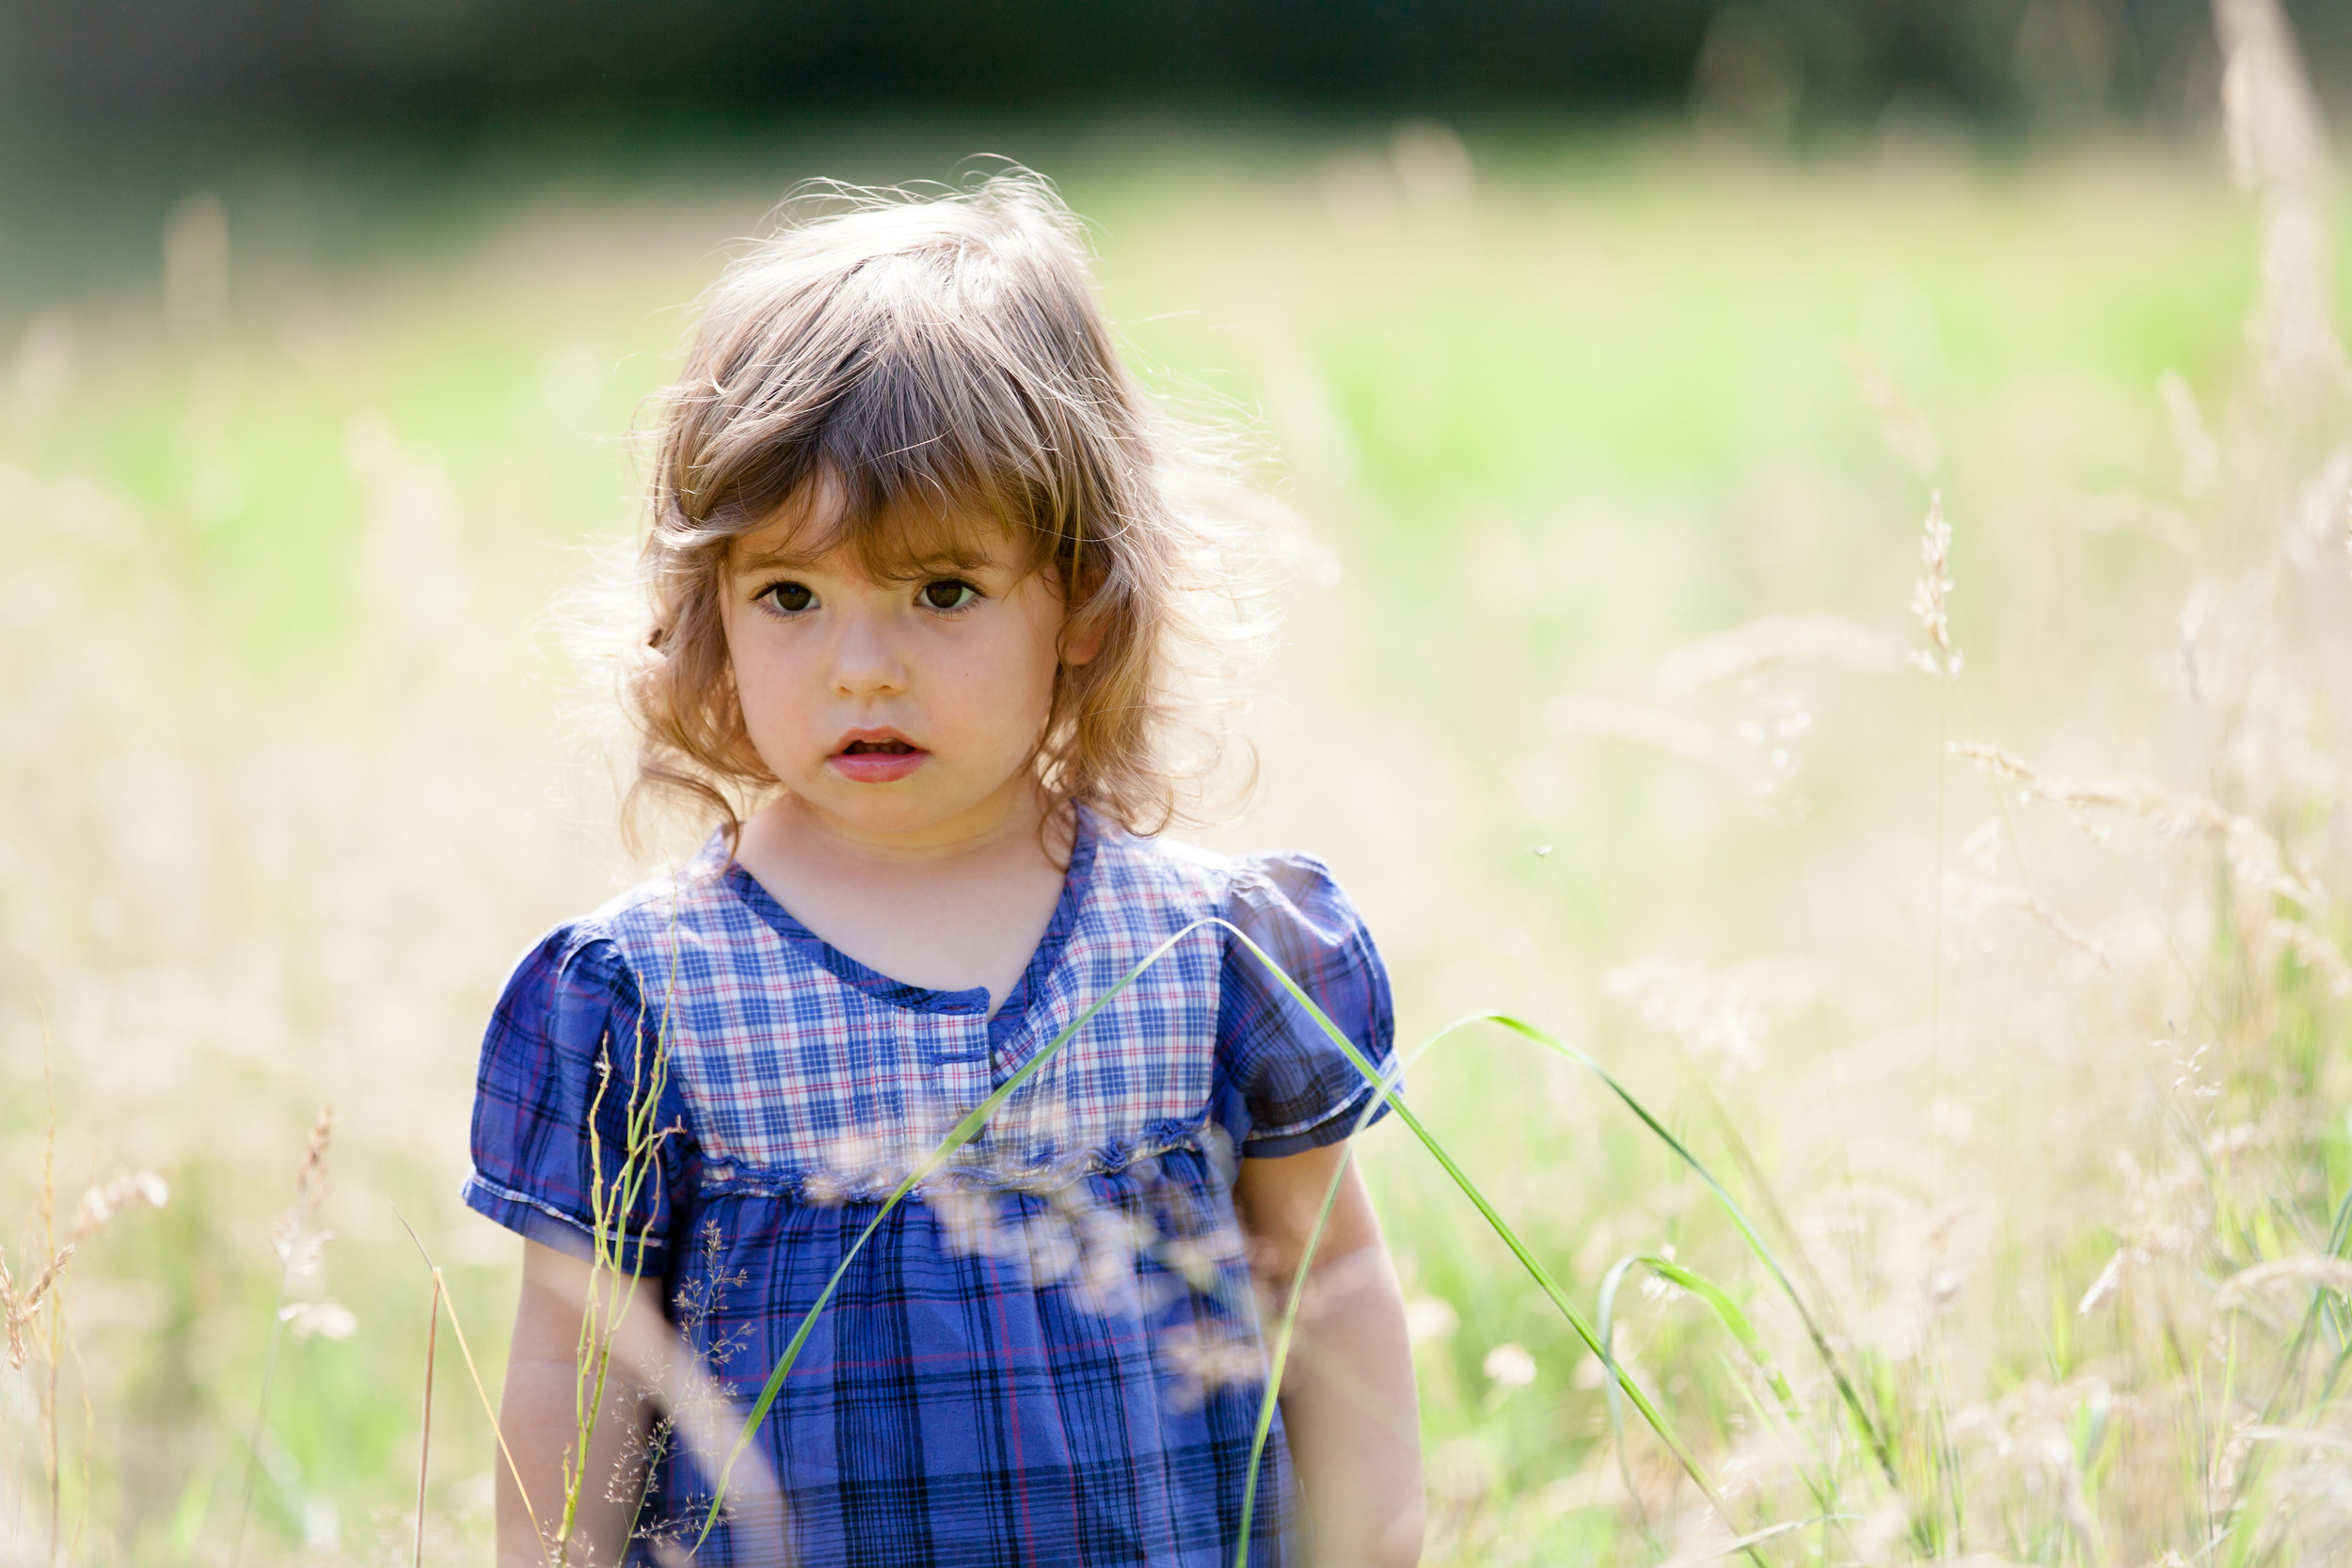 Kids-Portrait-Photography-Buckinghamshire020.jpg